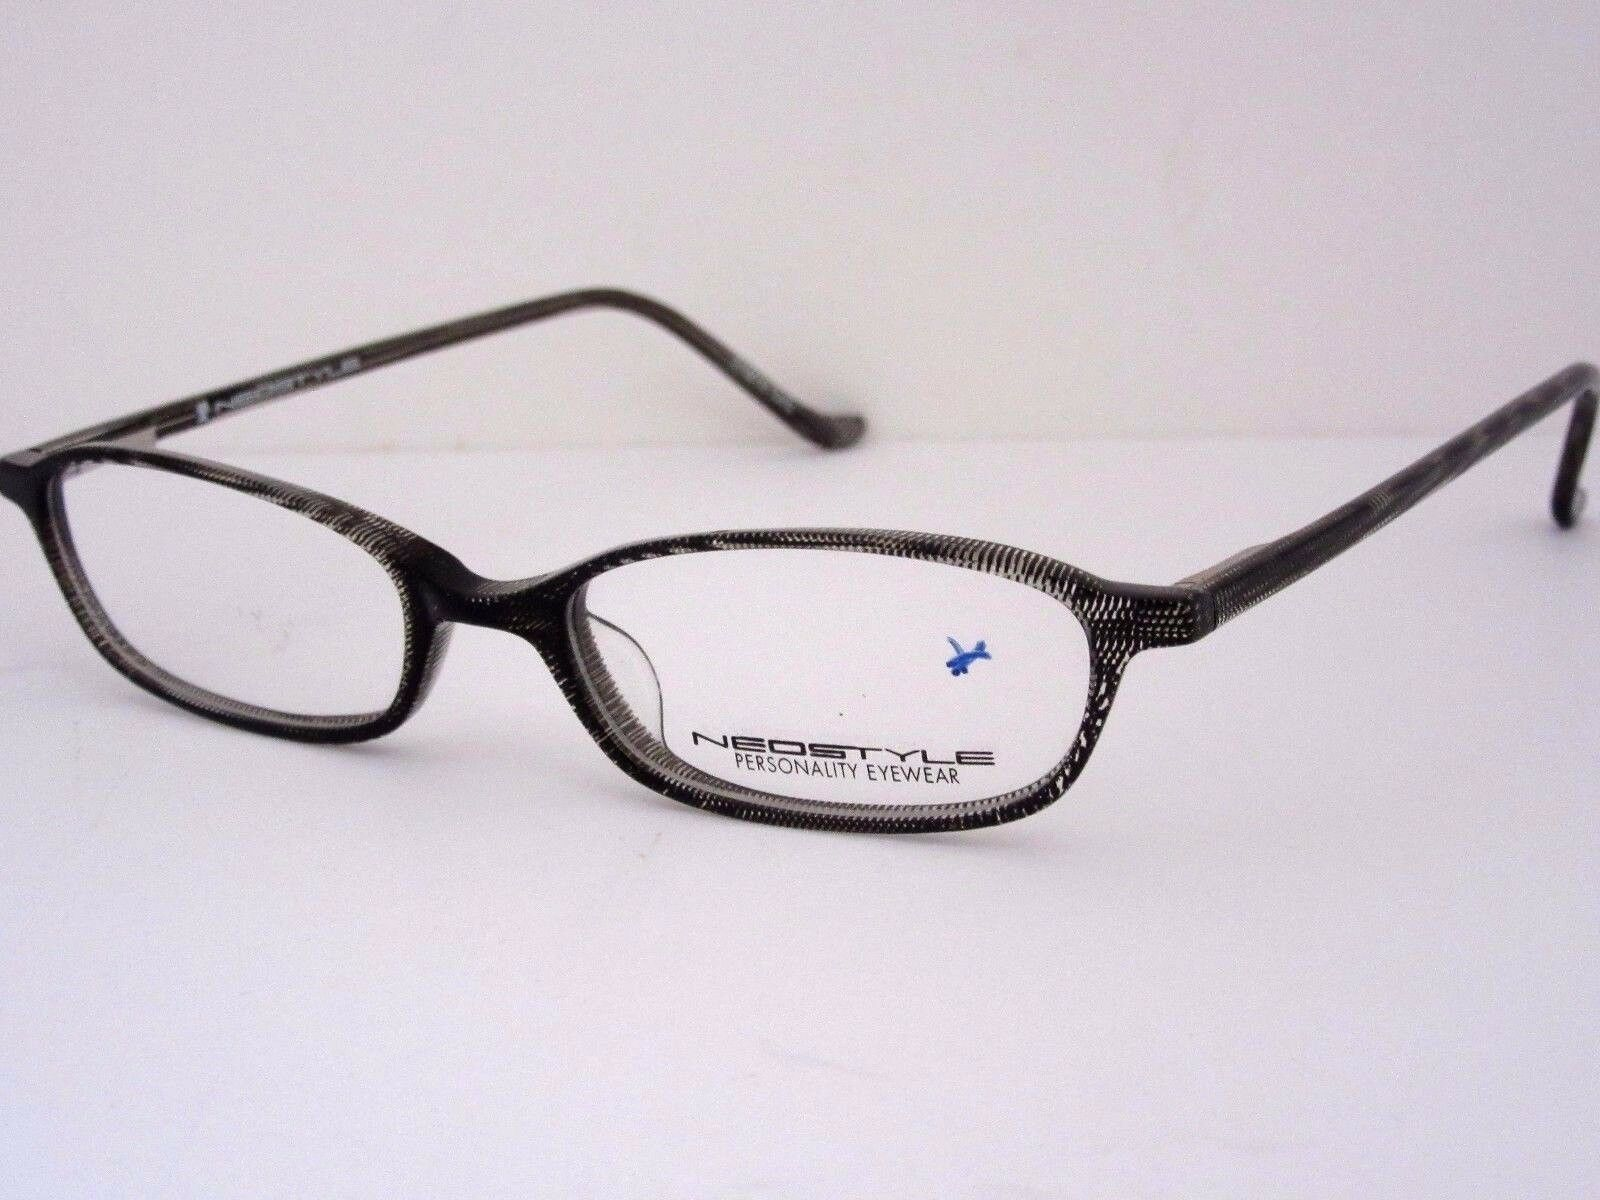 b0e1edd2875 NEOSTYLE College 264 615 Black  Clear Print Eyeglasses Frame Italy ...